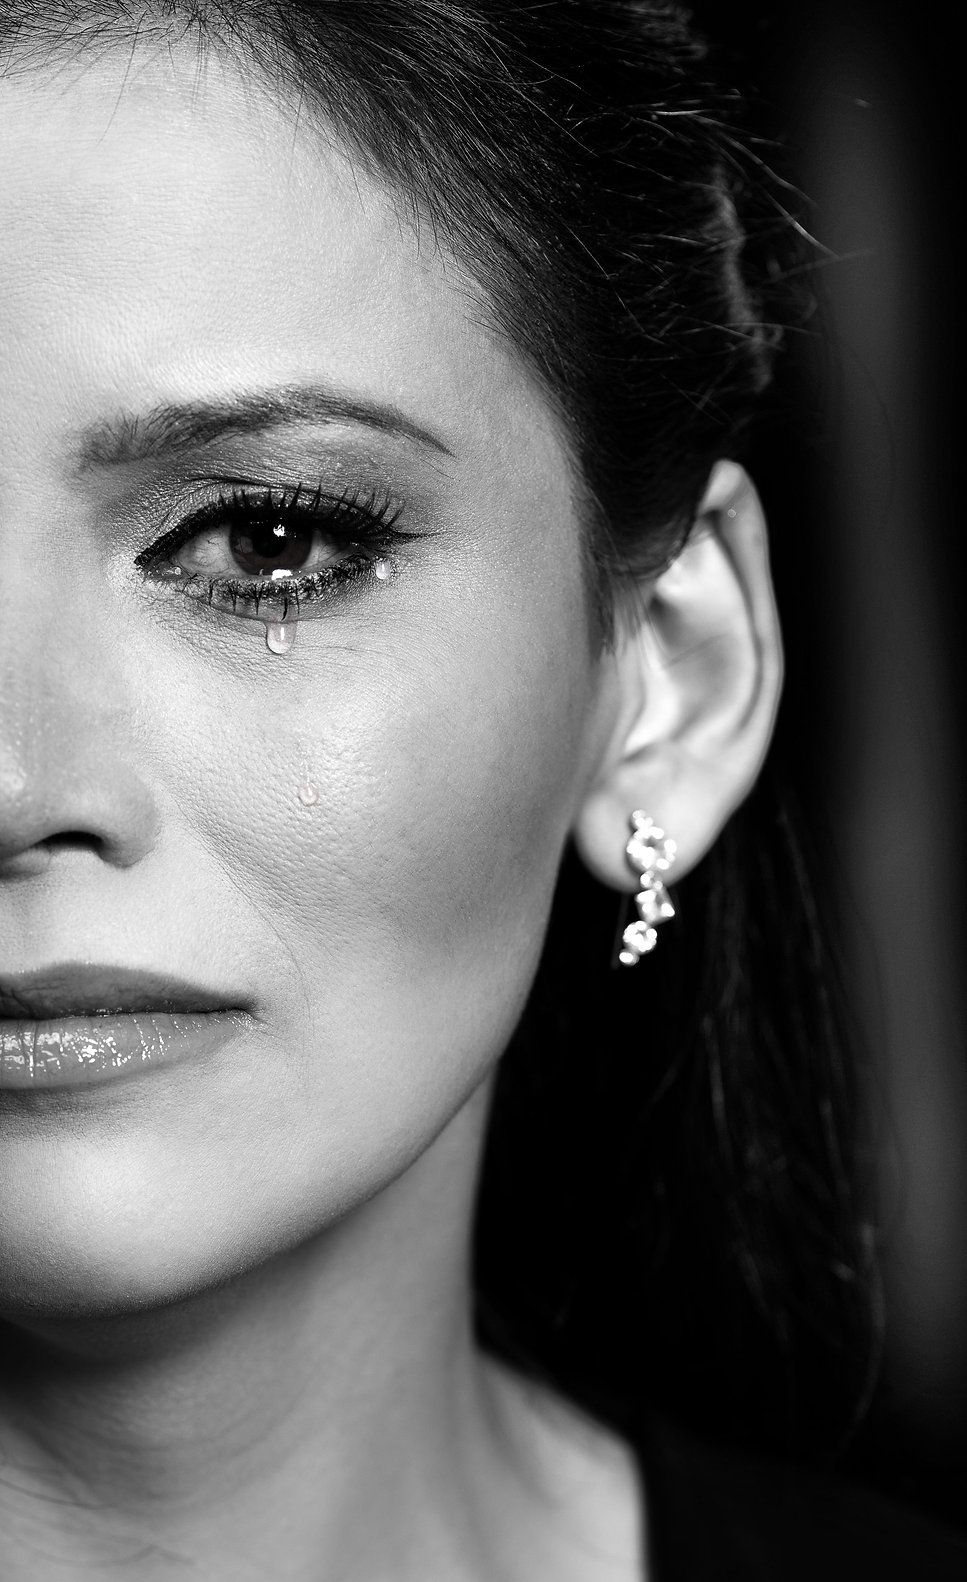 acting,actress,studio,movie,bnw,blackandwhite,emotion,eye